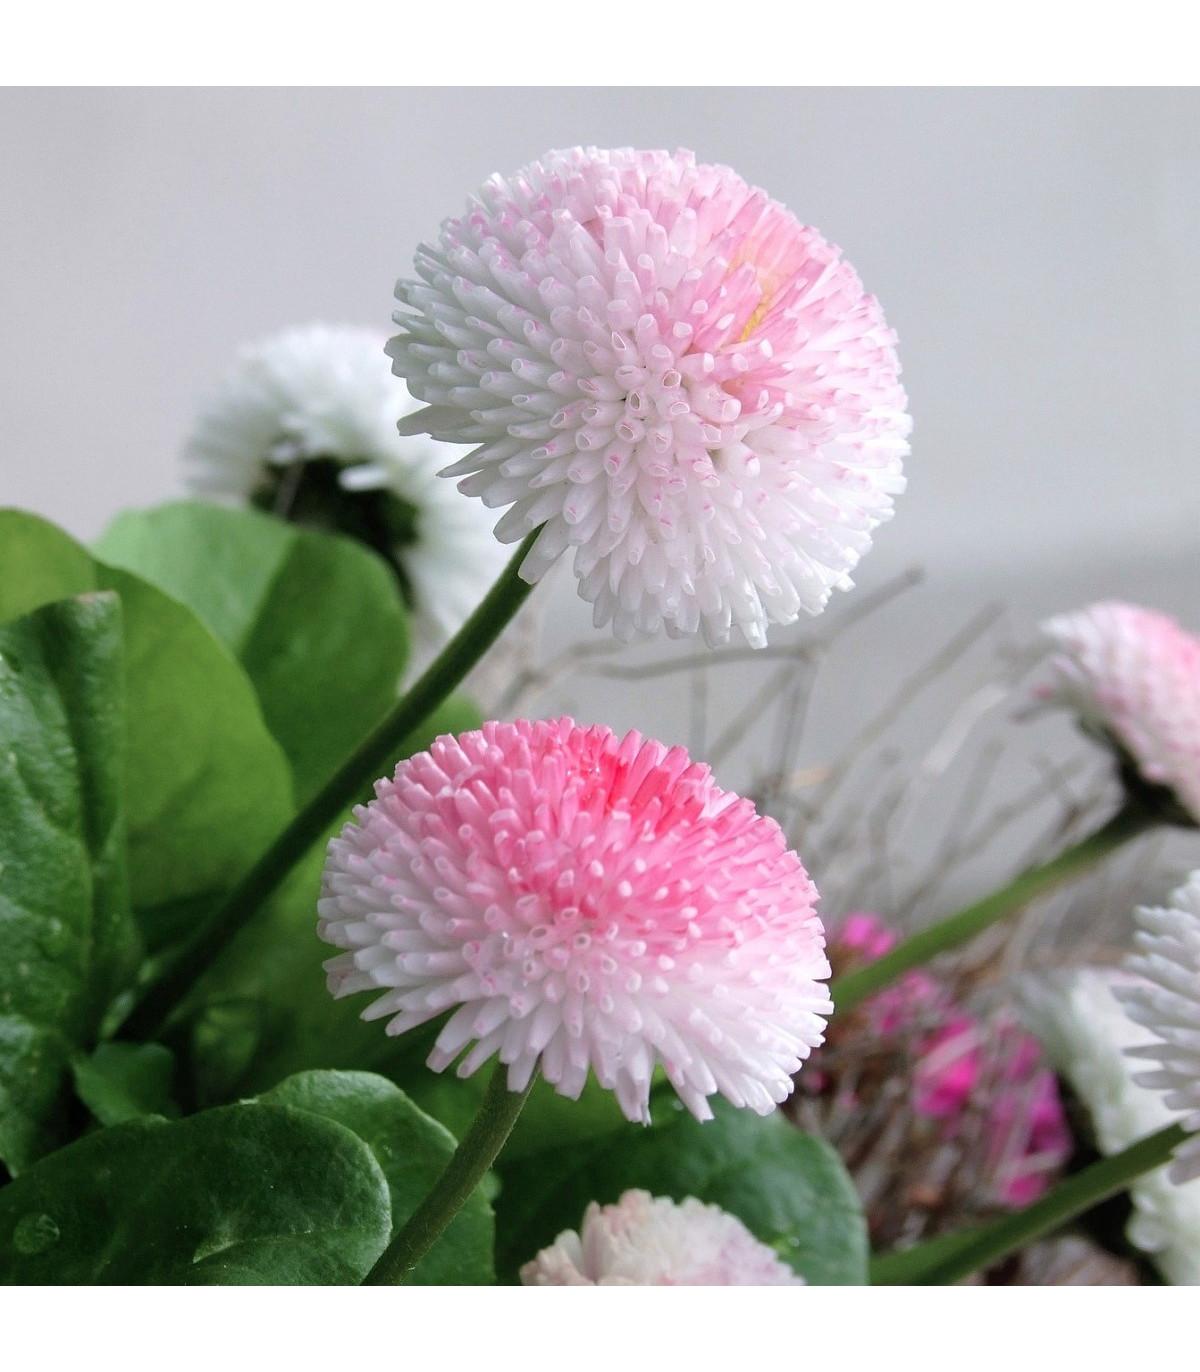 Sedmikráska chudobka Tasso růžová s červeným středem - Bellis perennis - semena sedmikrásky - 50 ks